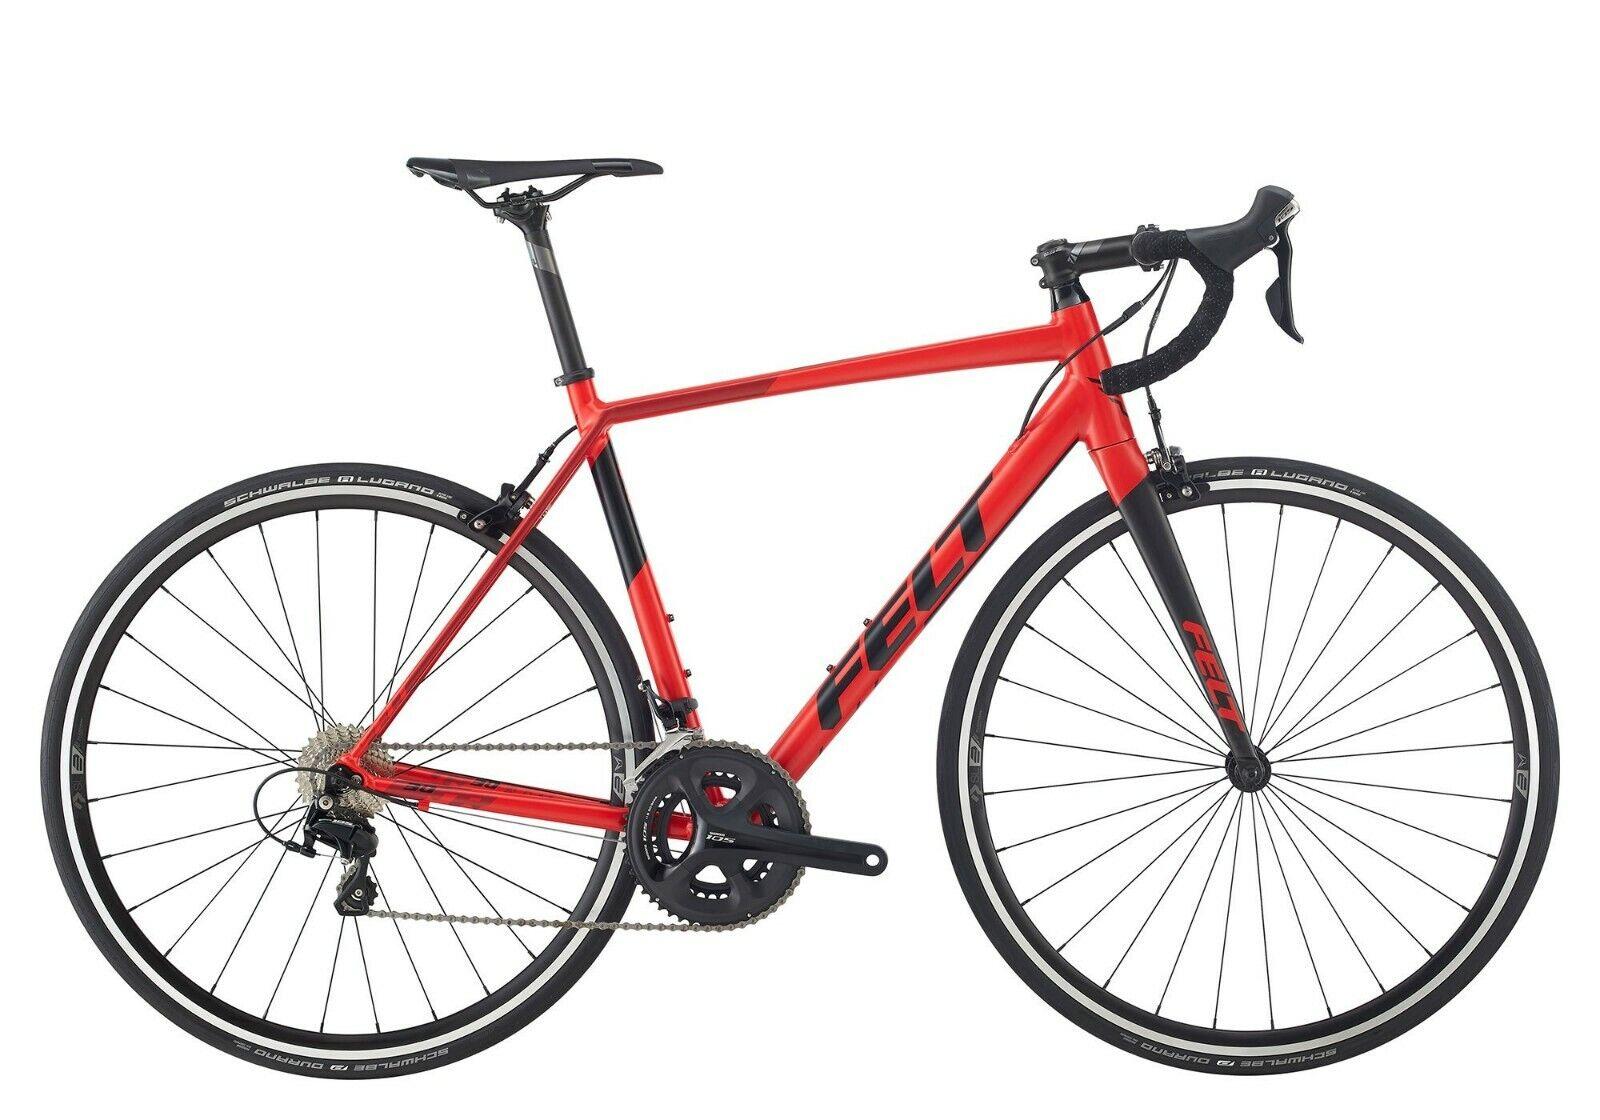 2018 Felt FR30 Aluminum 105 Road Bike 56cm Retail